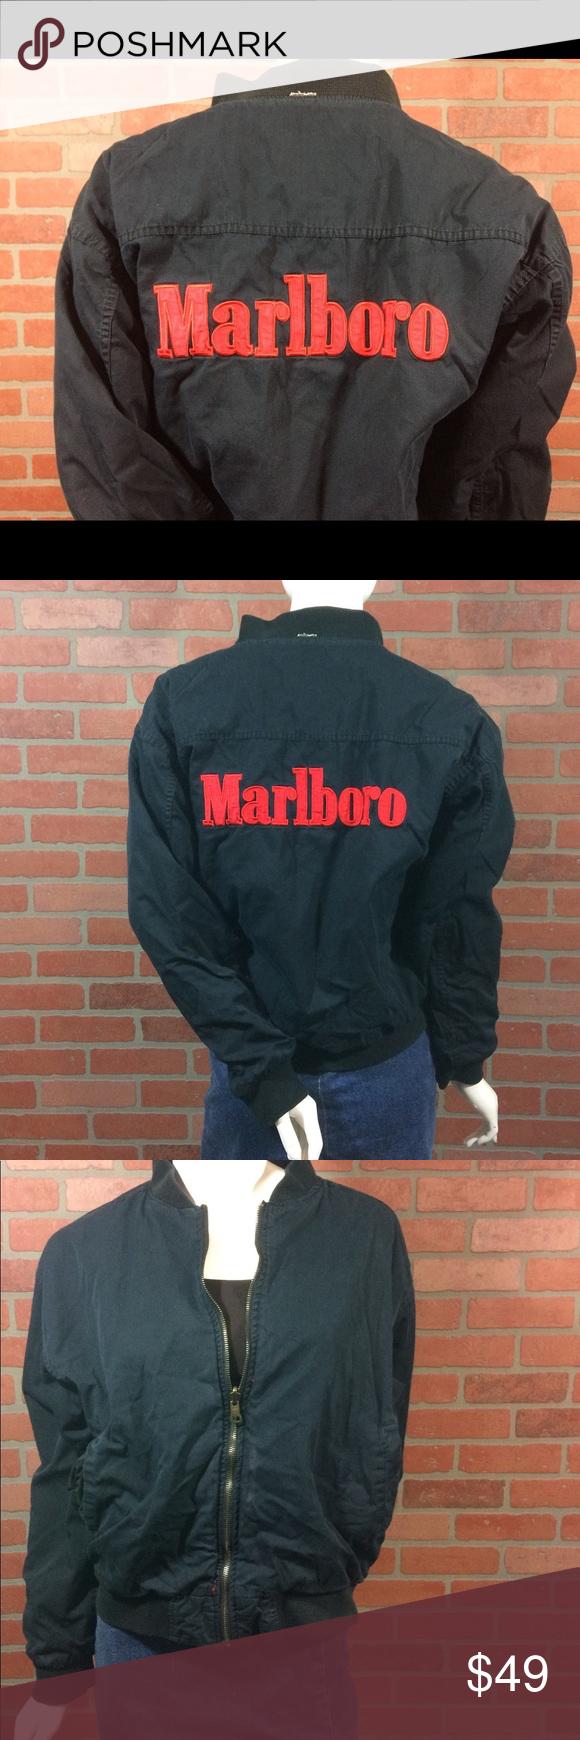 Vintage Marlboro Jacket Reversible Red Black S Marlboro Jacket Black And Red Jackets